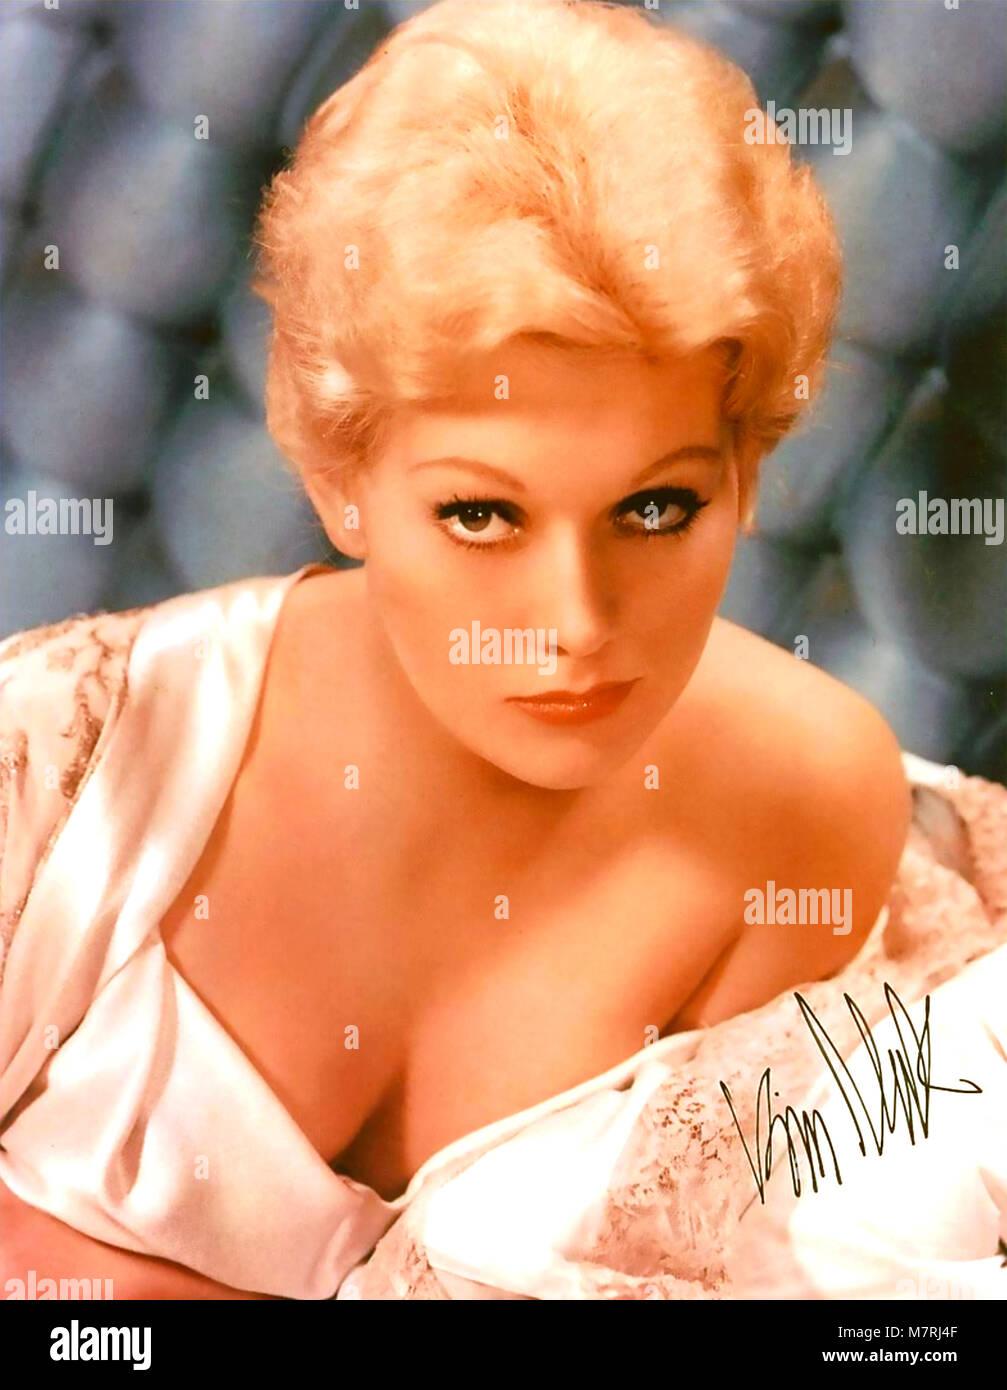 KIM NOVAK American film actress about 1962 - Stock Image